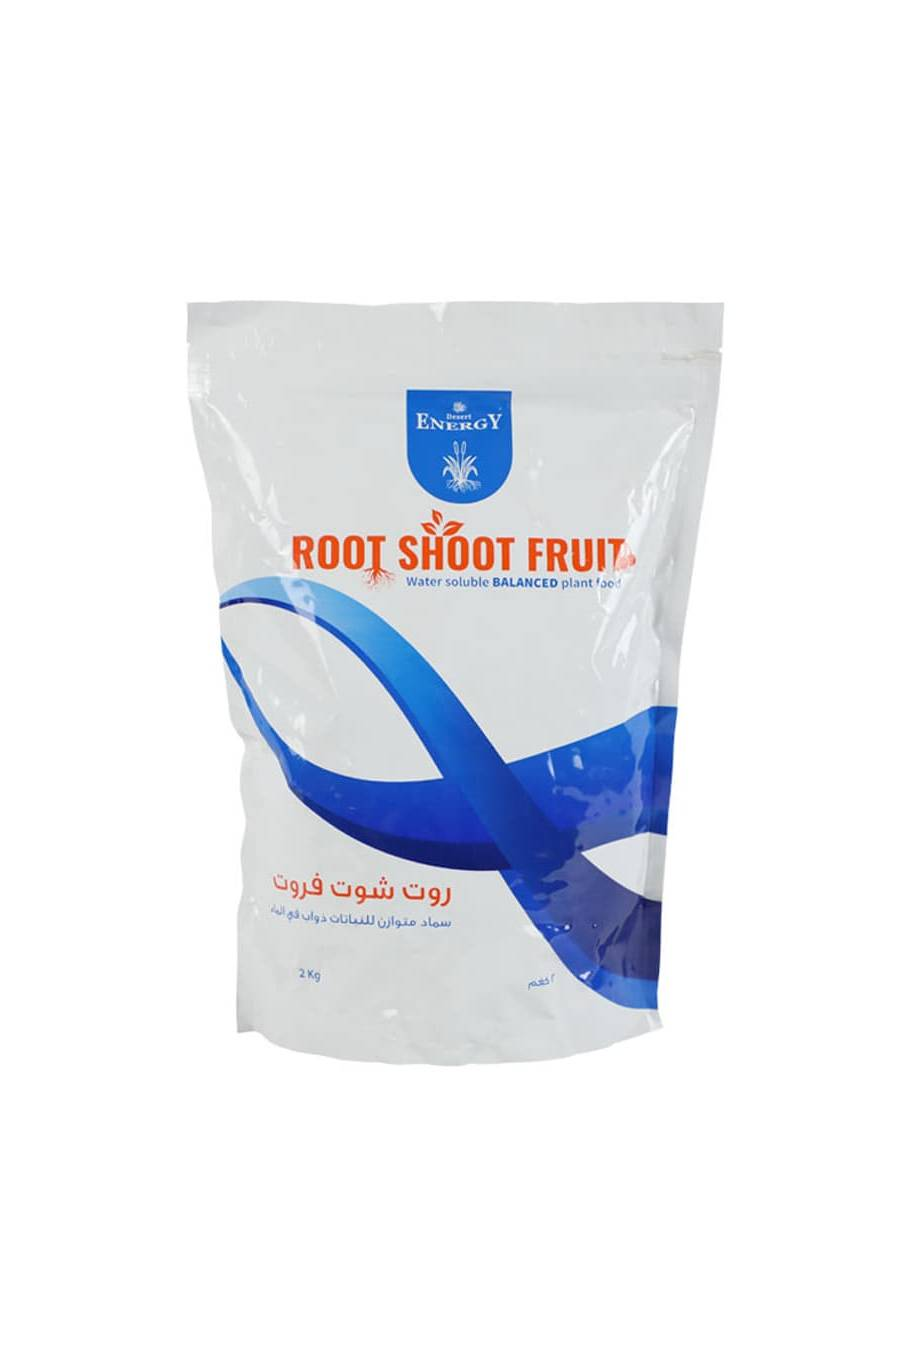 Root Shoot Fruit